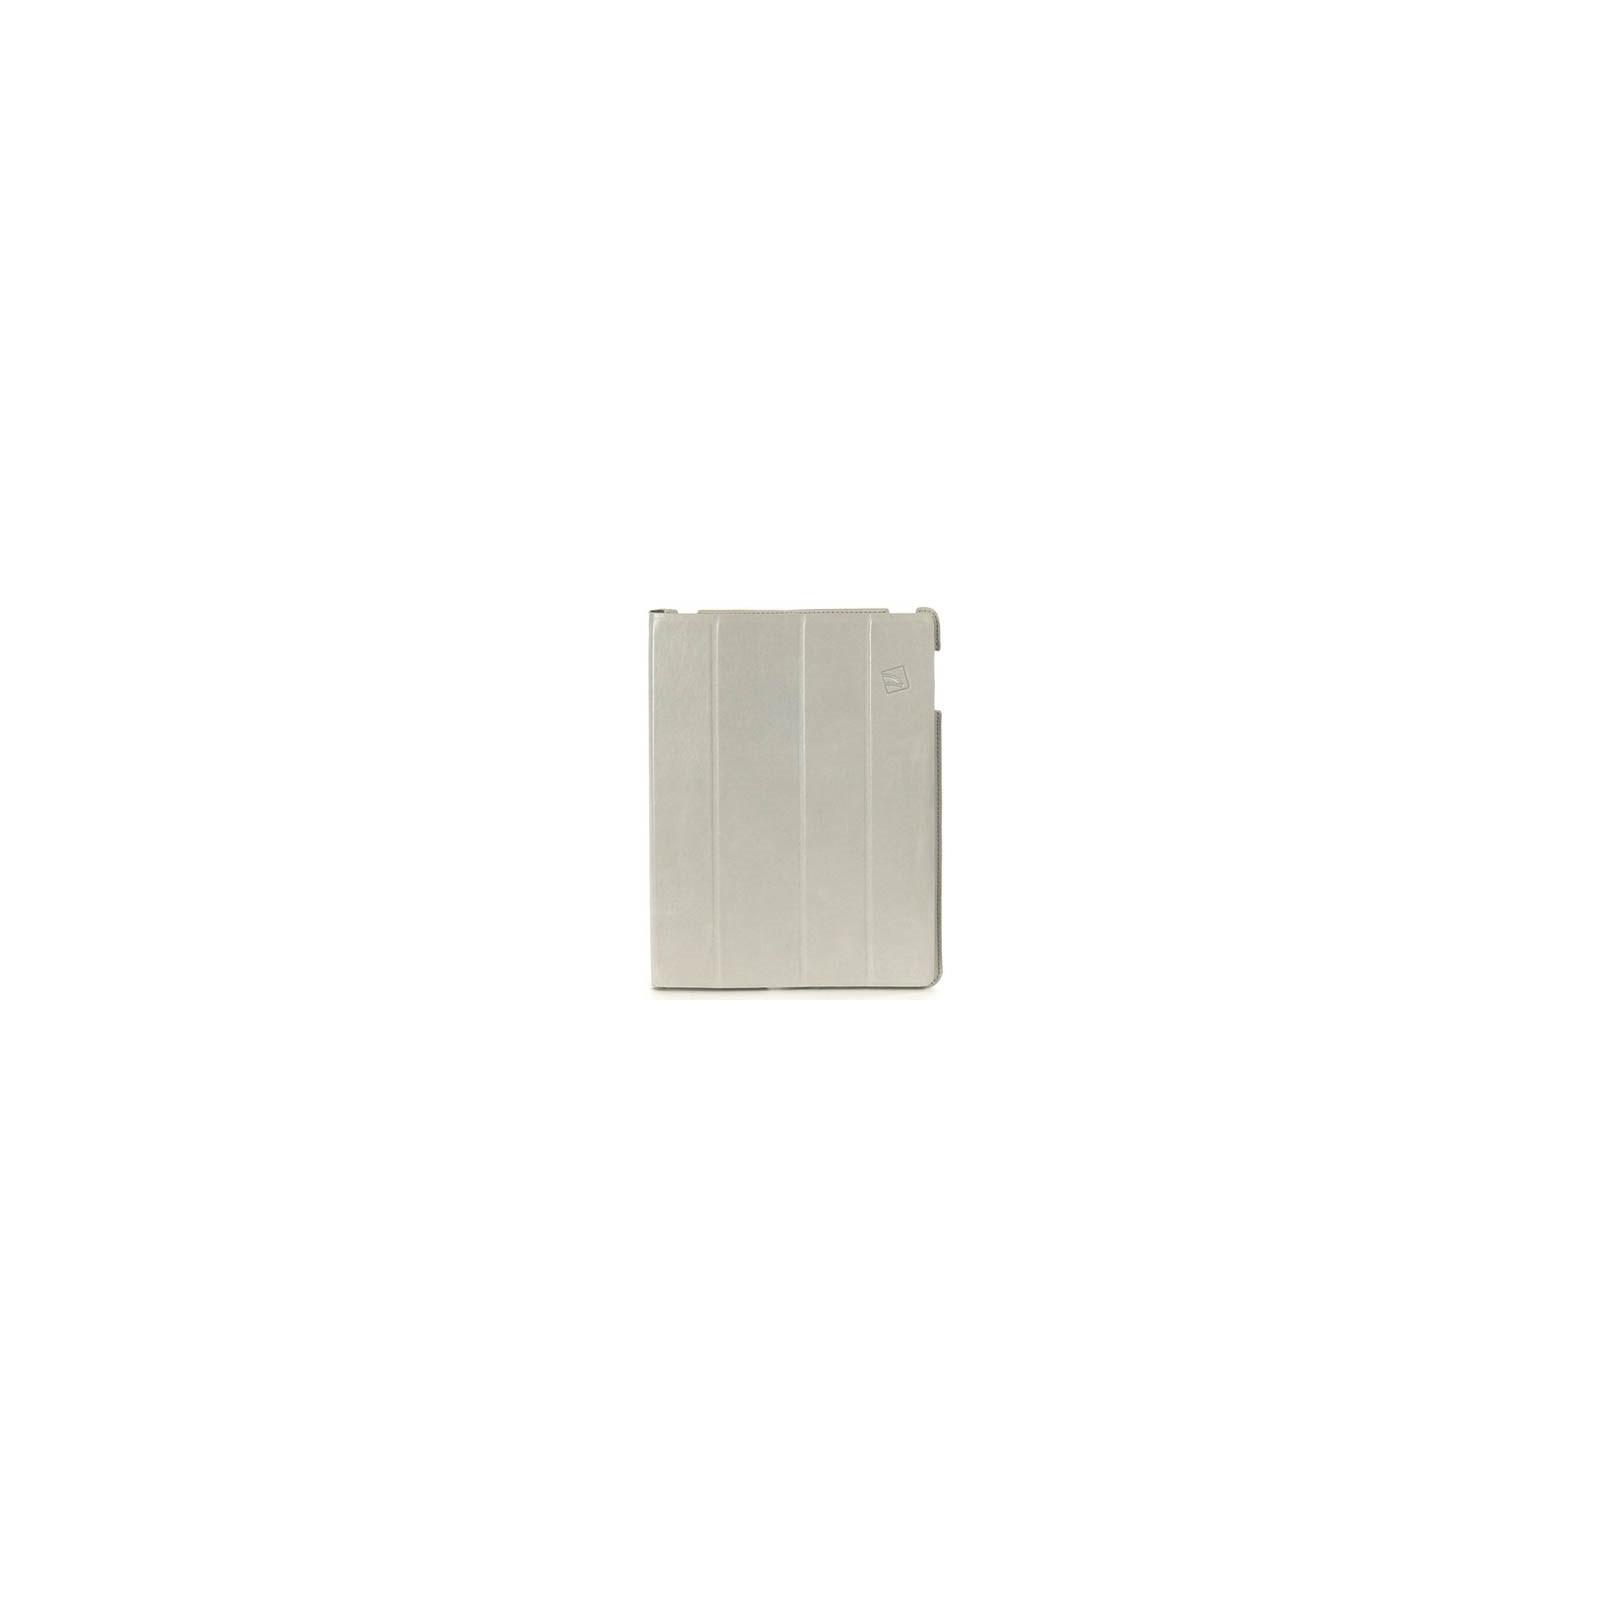 Чехол для планшета Tucano iPad2/3/4 Flexo Leather (Grey) (IPDFLE-G)